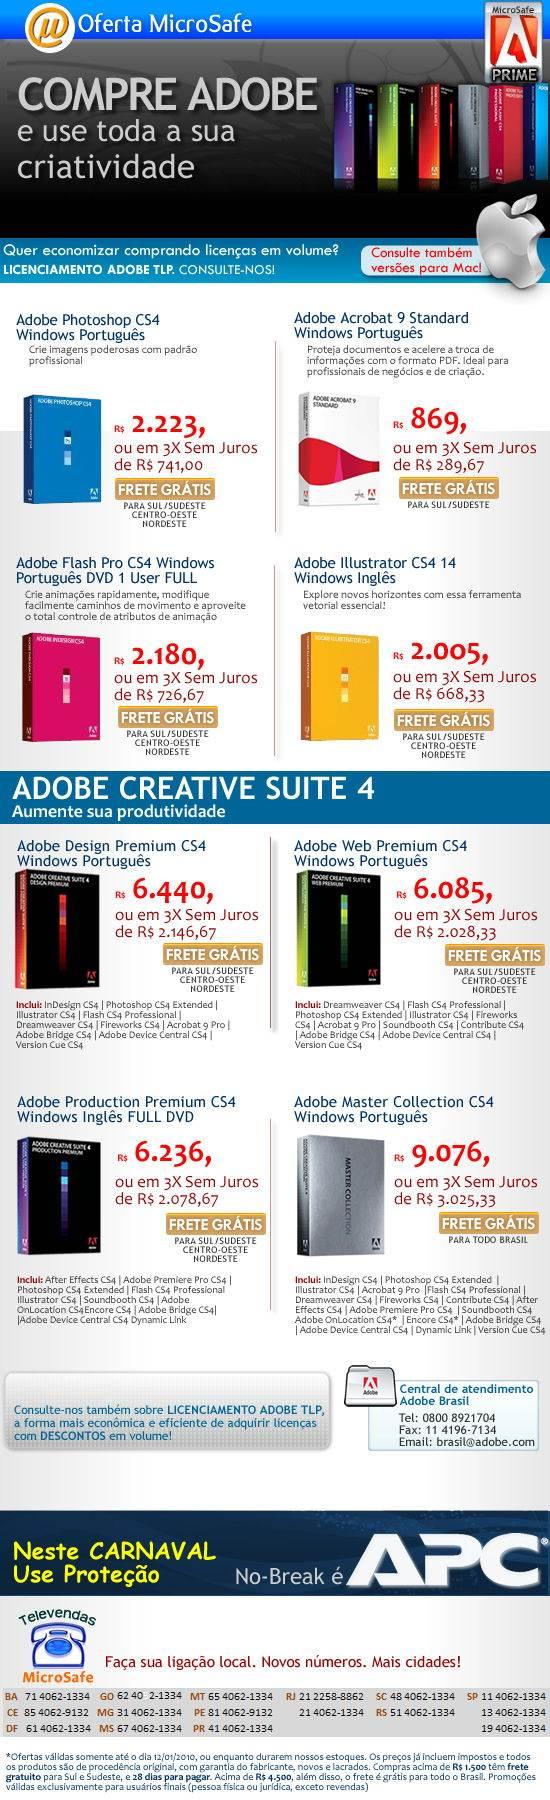 Adobe na Microsafe!